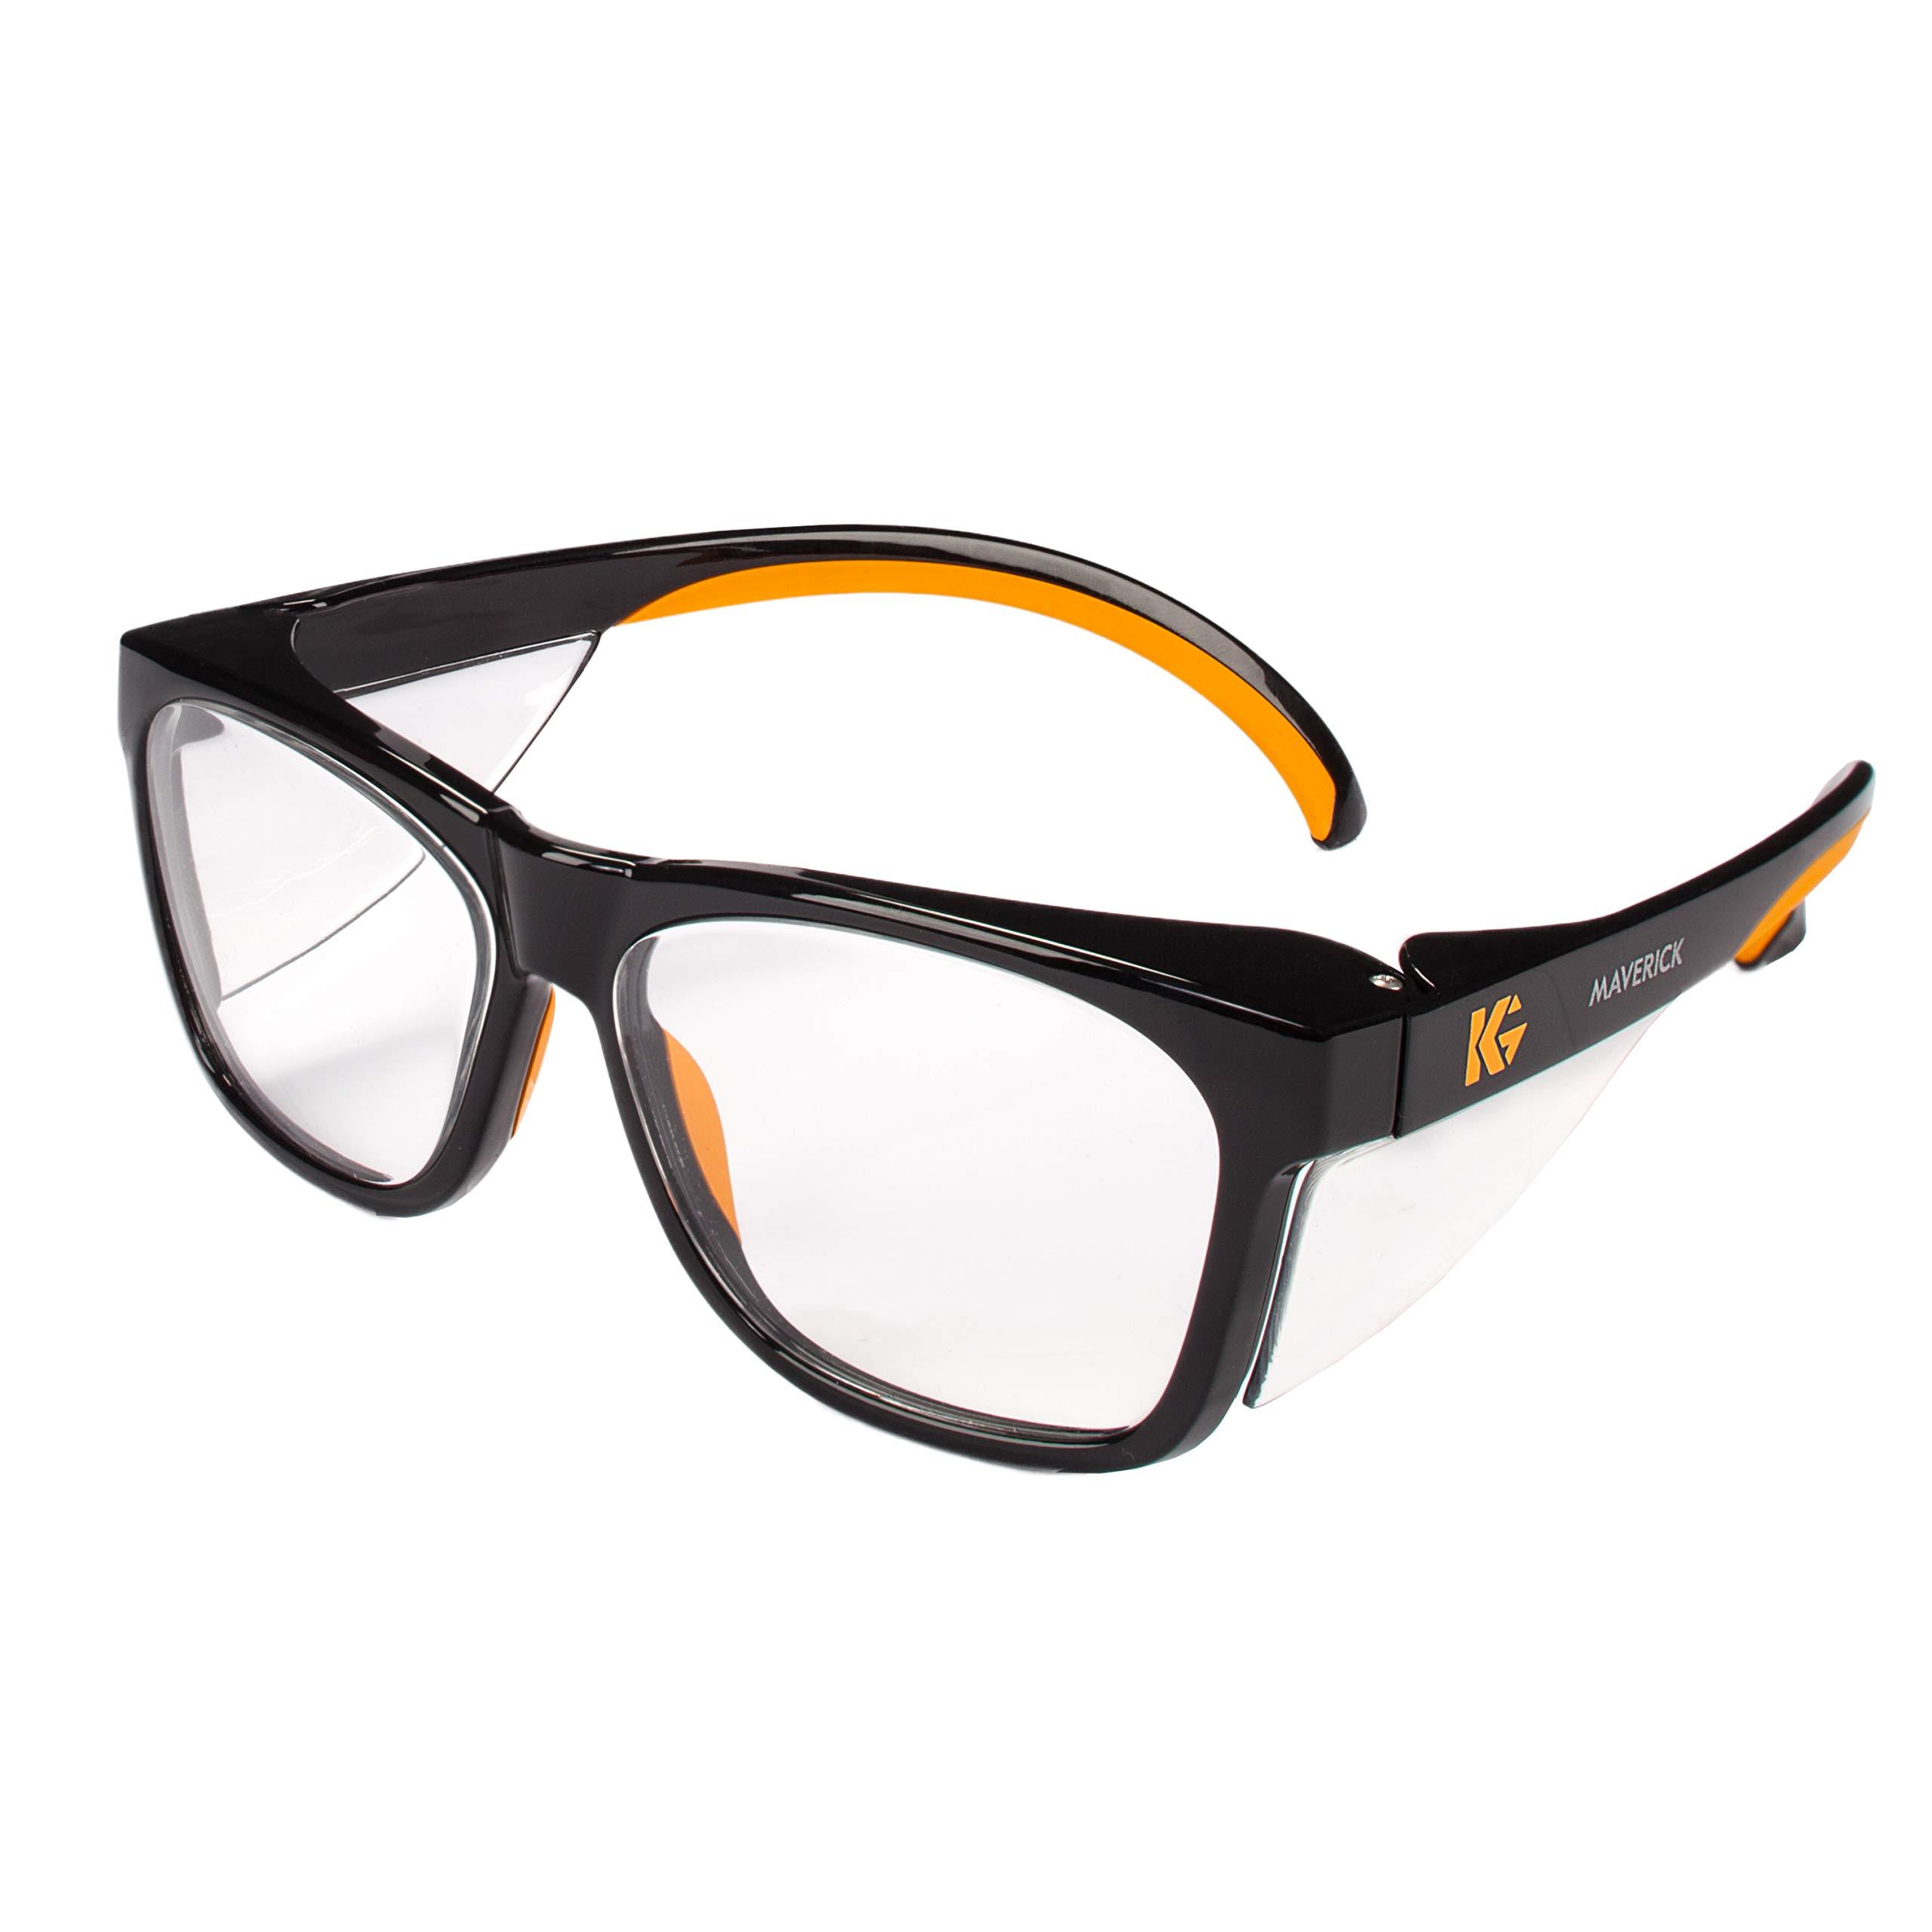 Kleenguard 49312 Maverick Safety Glasses, Black (Pack of 12)